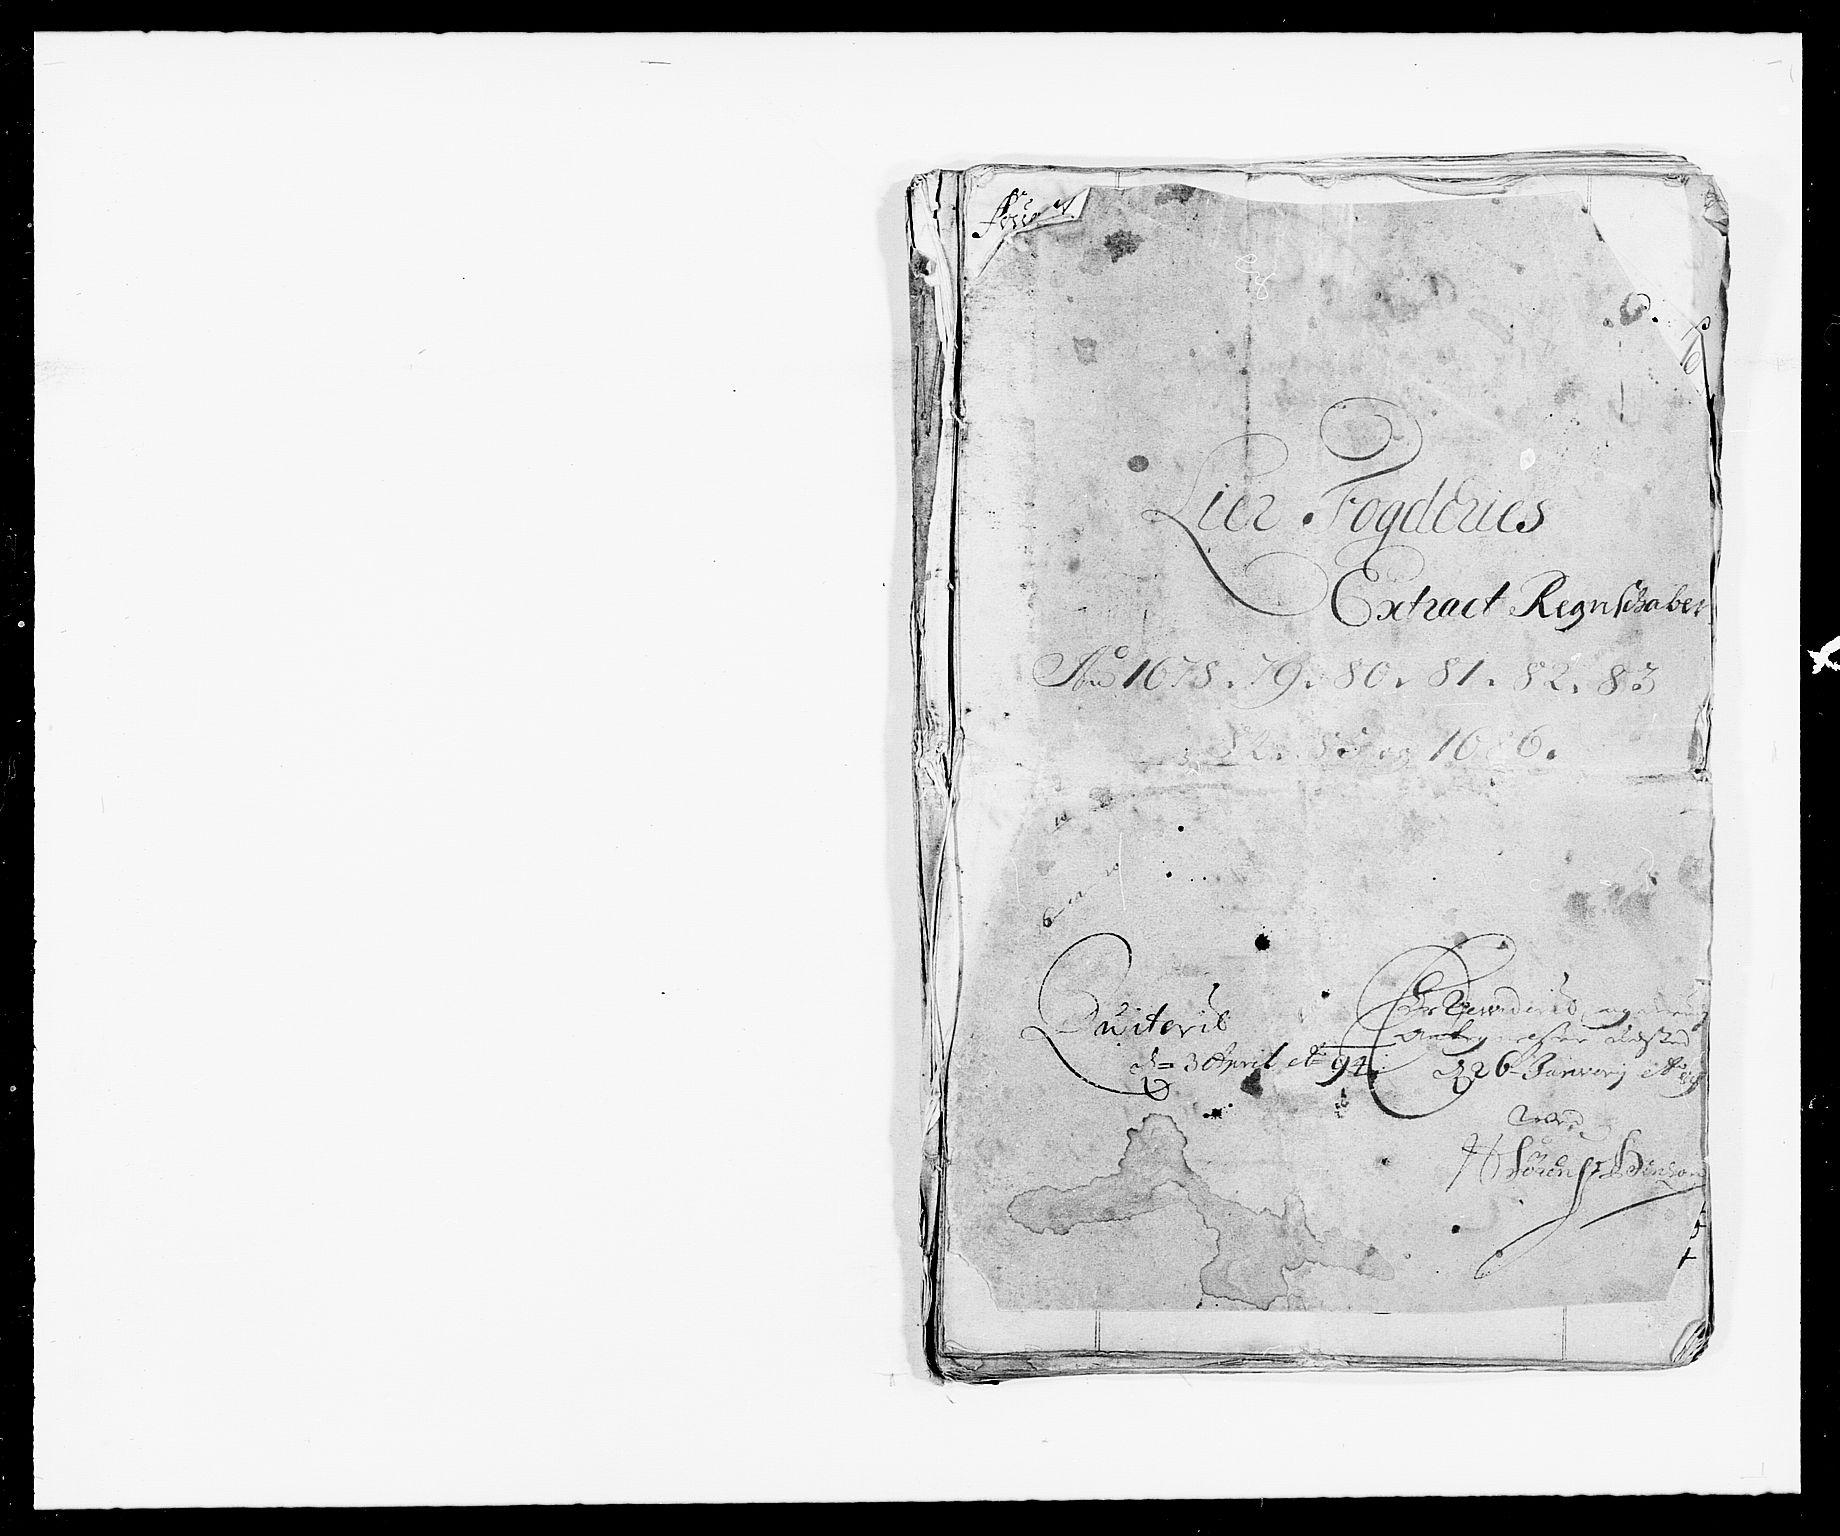 RA, Rentekammeret inntil 1814, Reviderte regnskaper, Fogderegnskap, R27/L1686: Fogderegnskap Lier, 1678-1686, s. 1